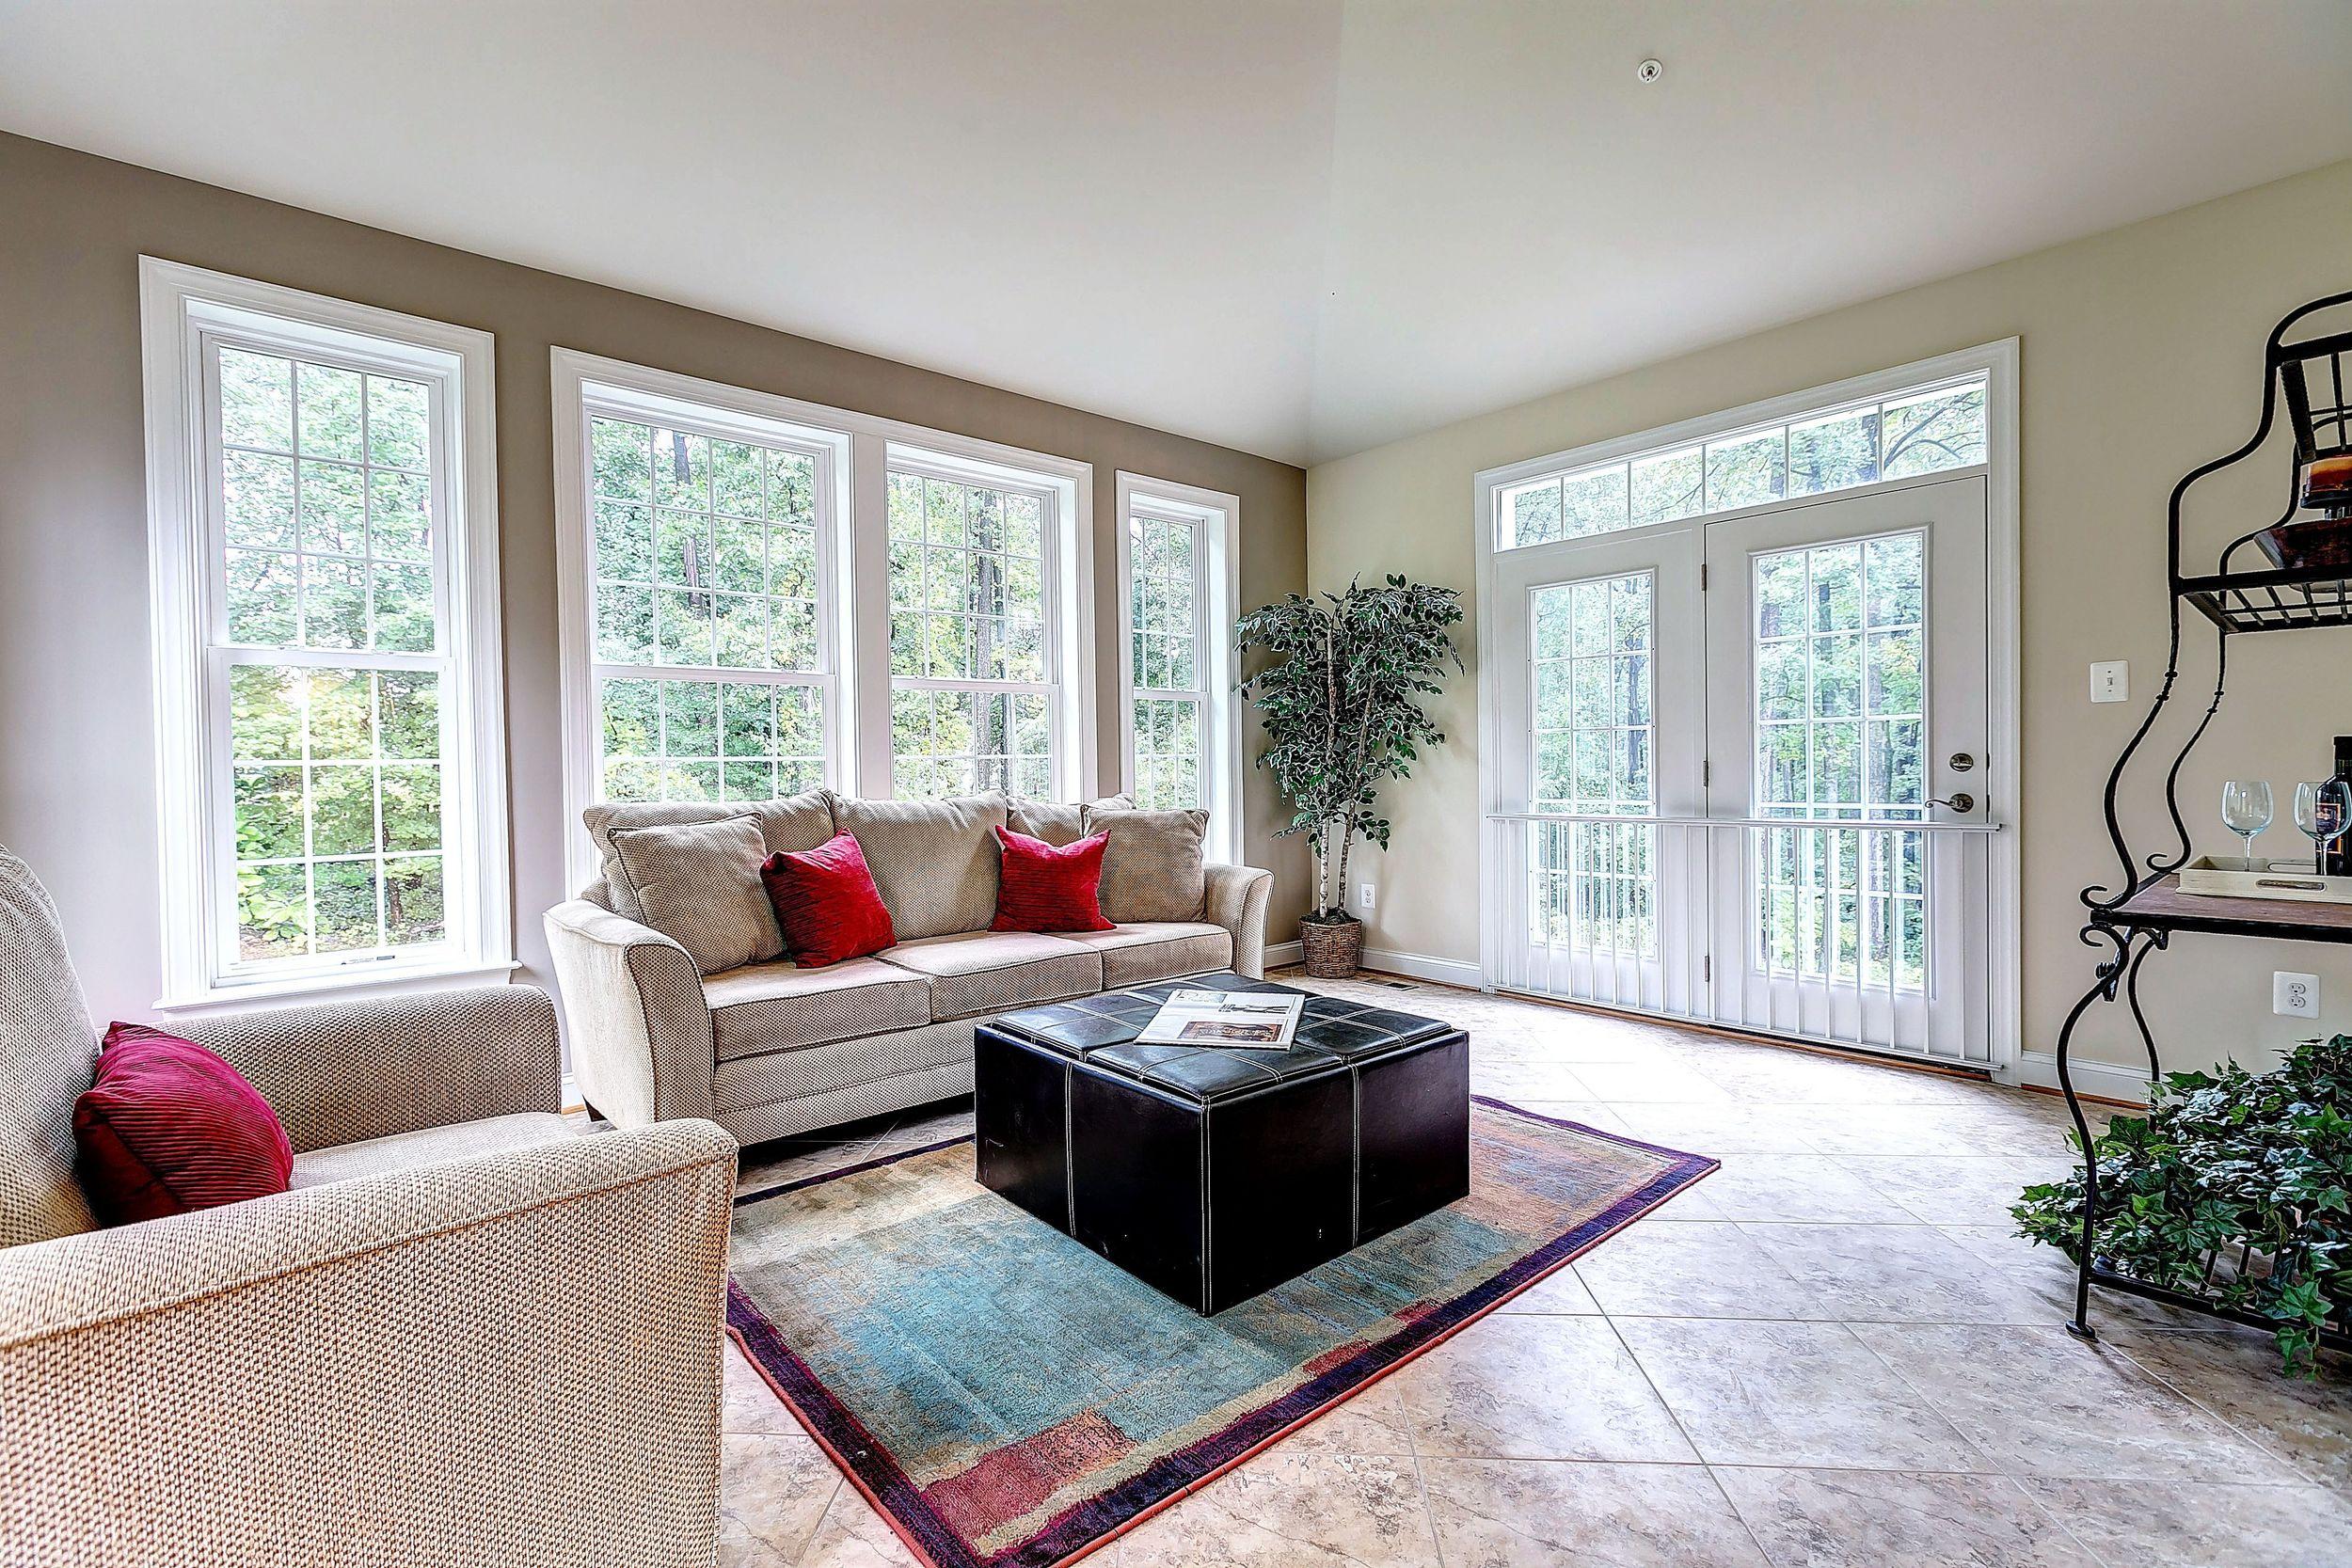 rylea-homes-custom-home-16.jpg